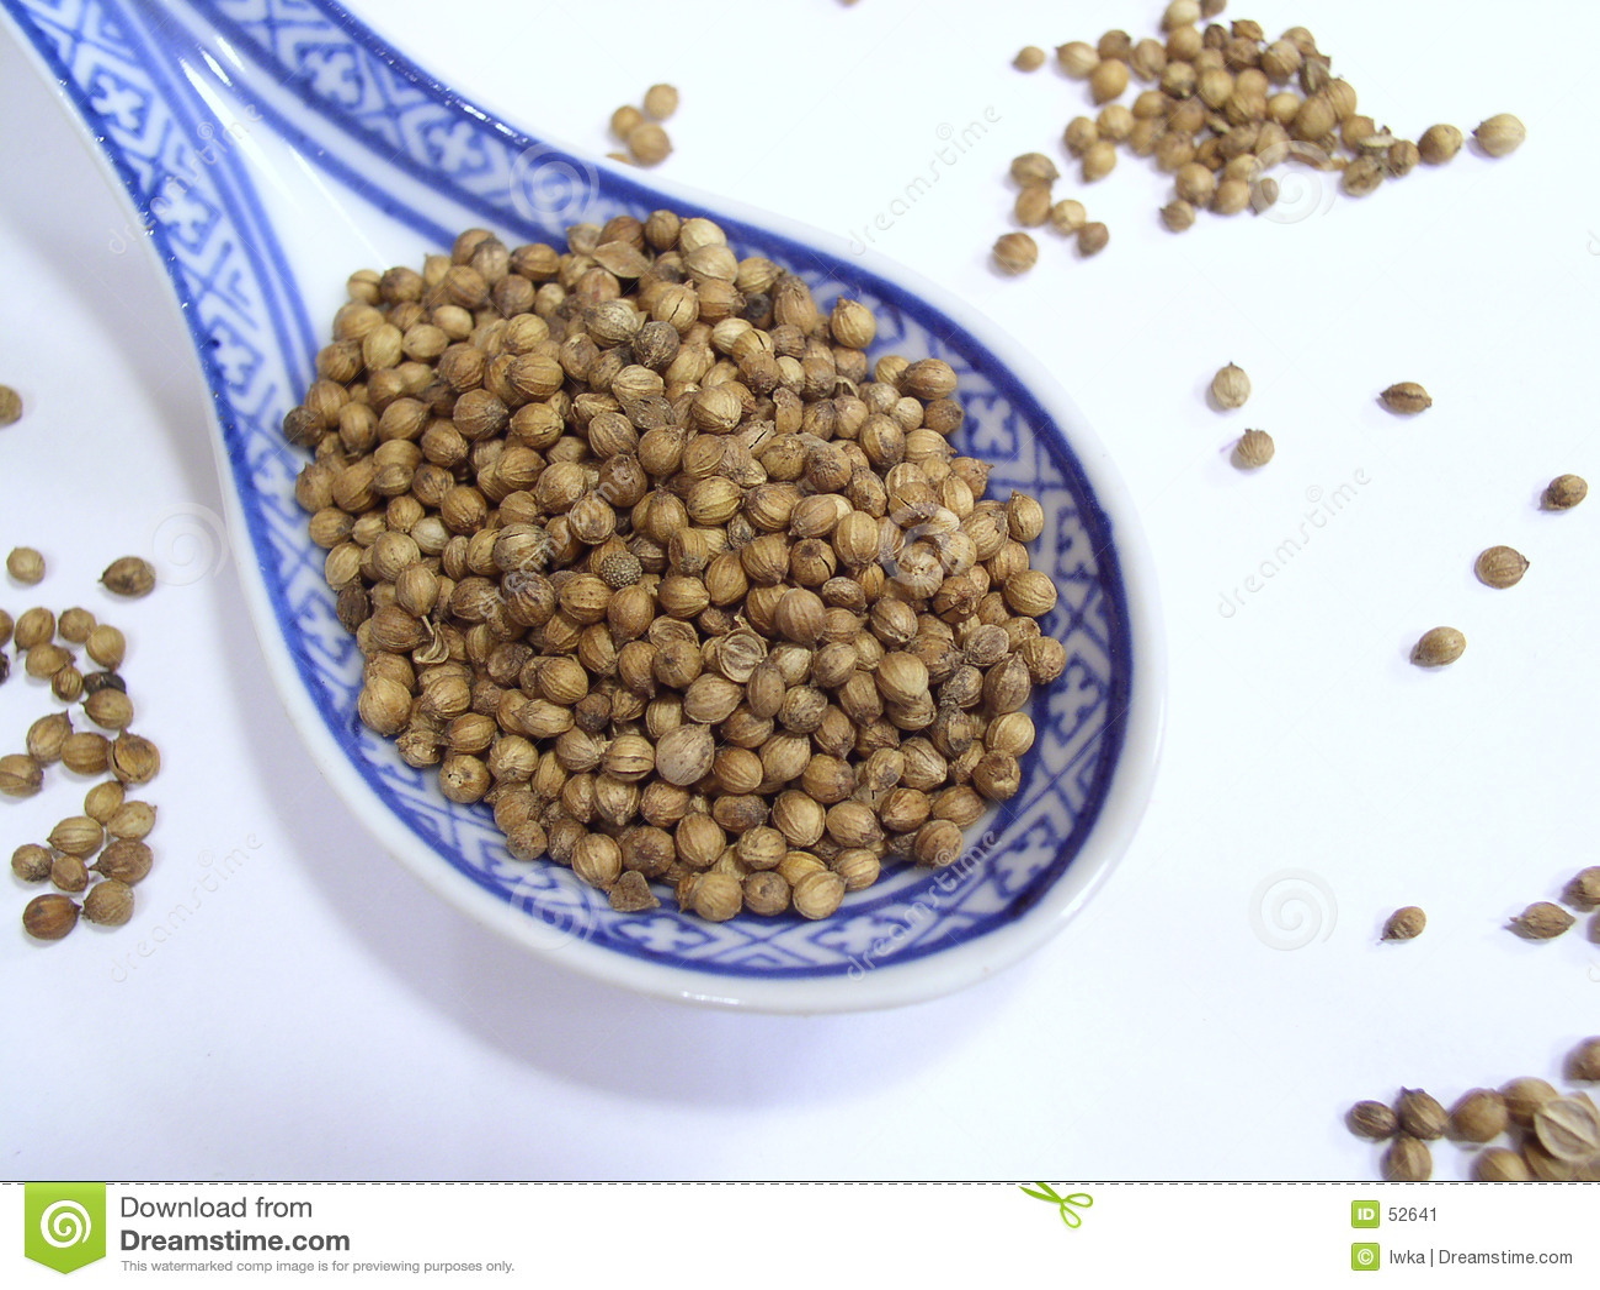 Download Graines de coriandre image stock. Image du goût, cuisine - 52641